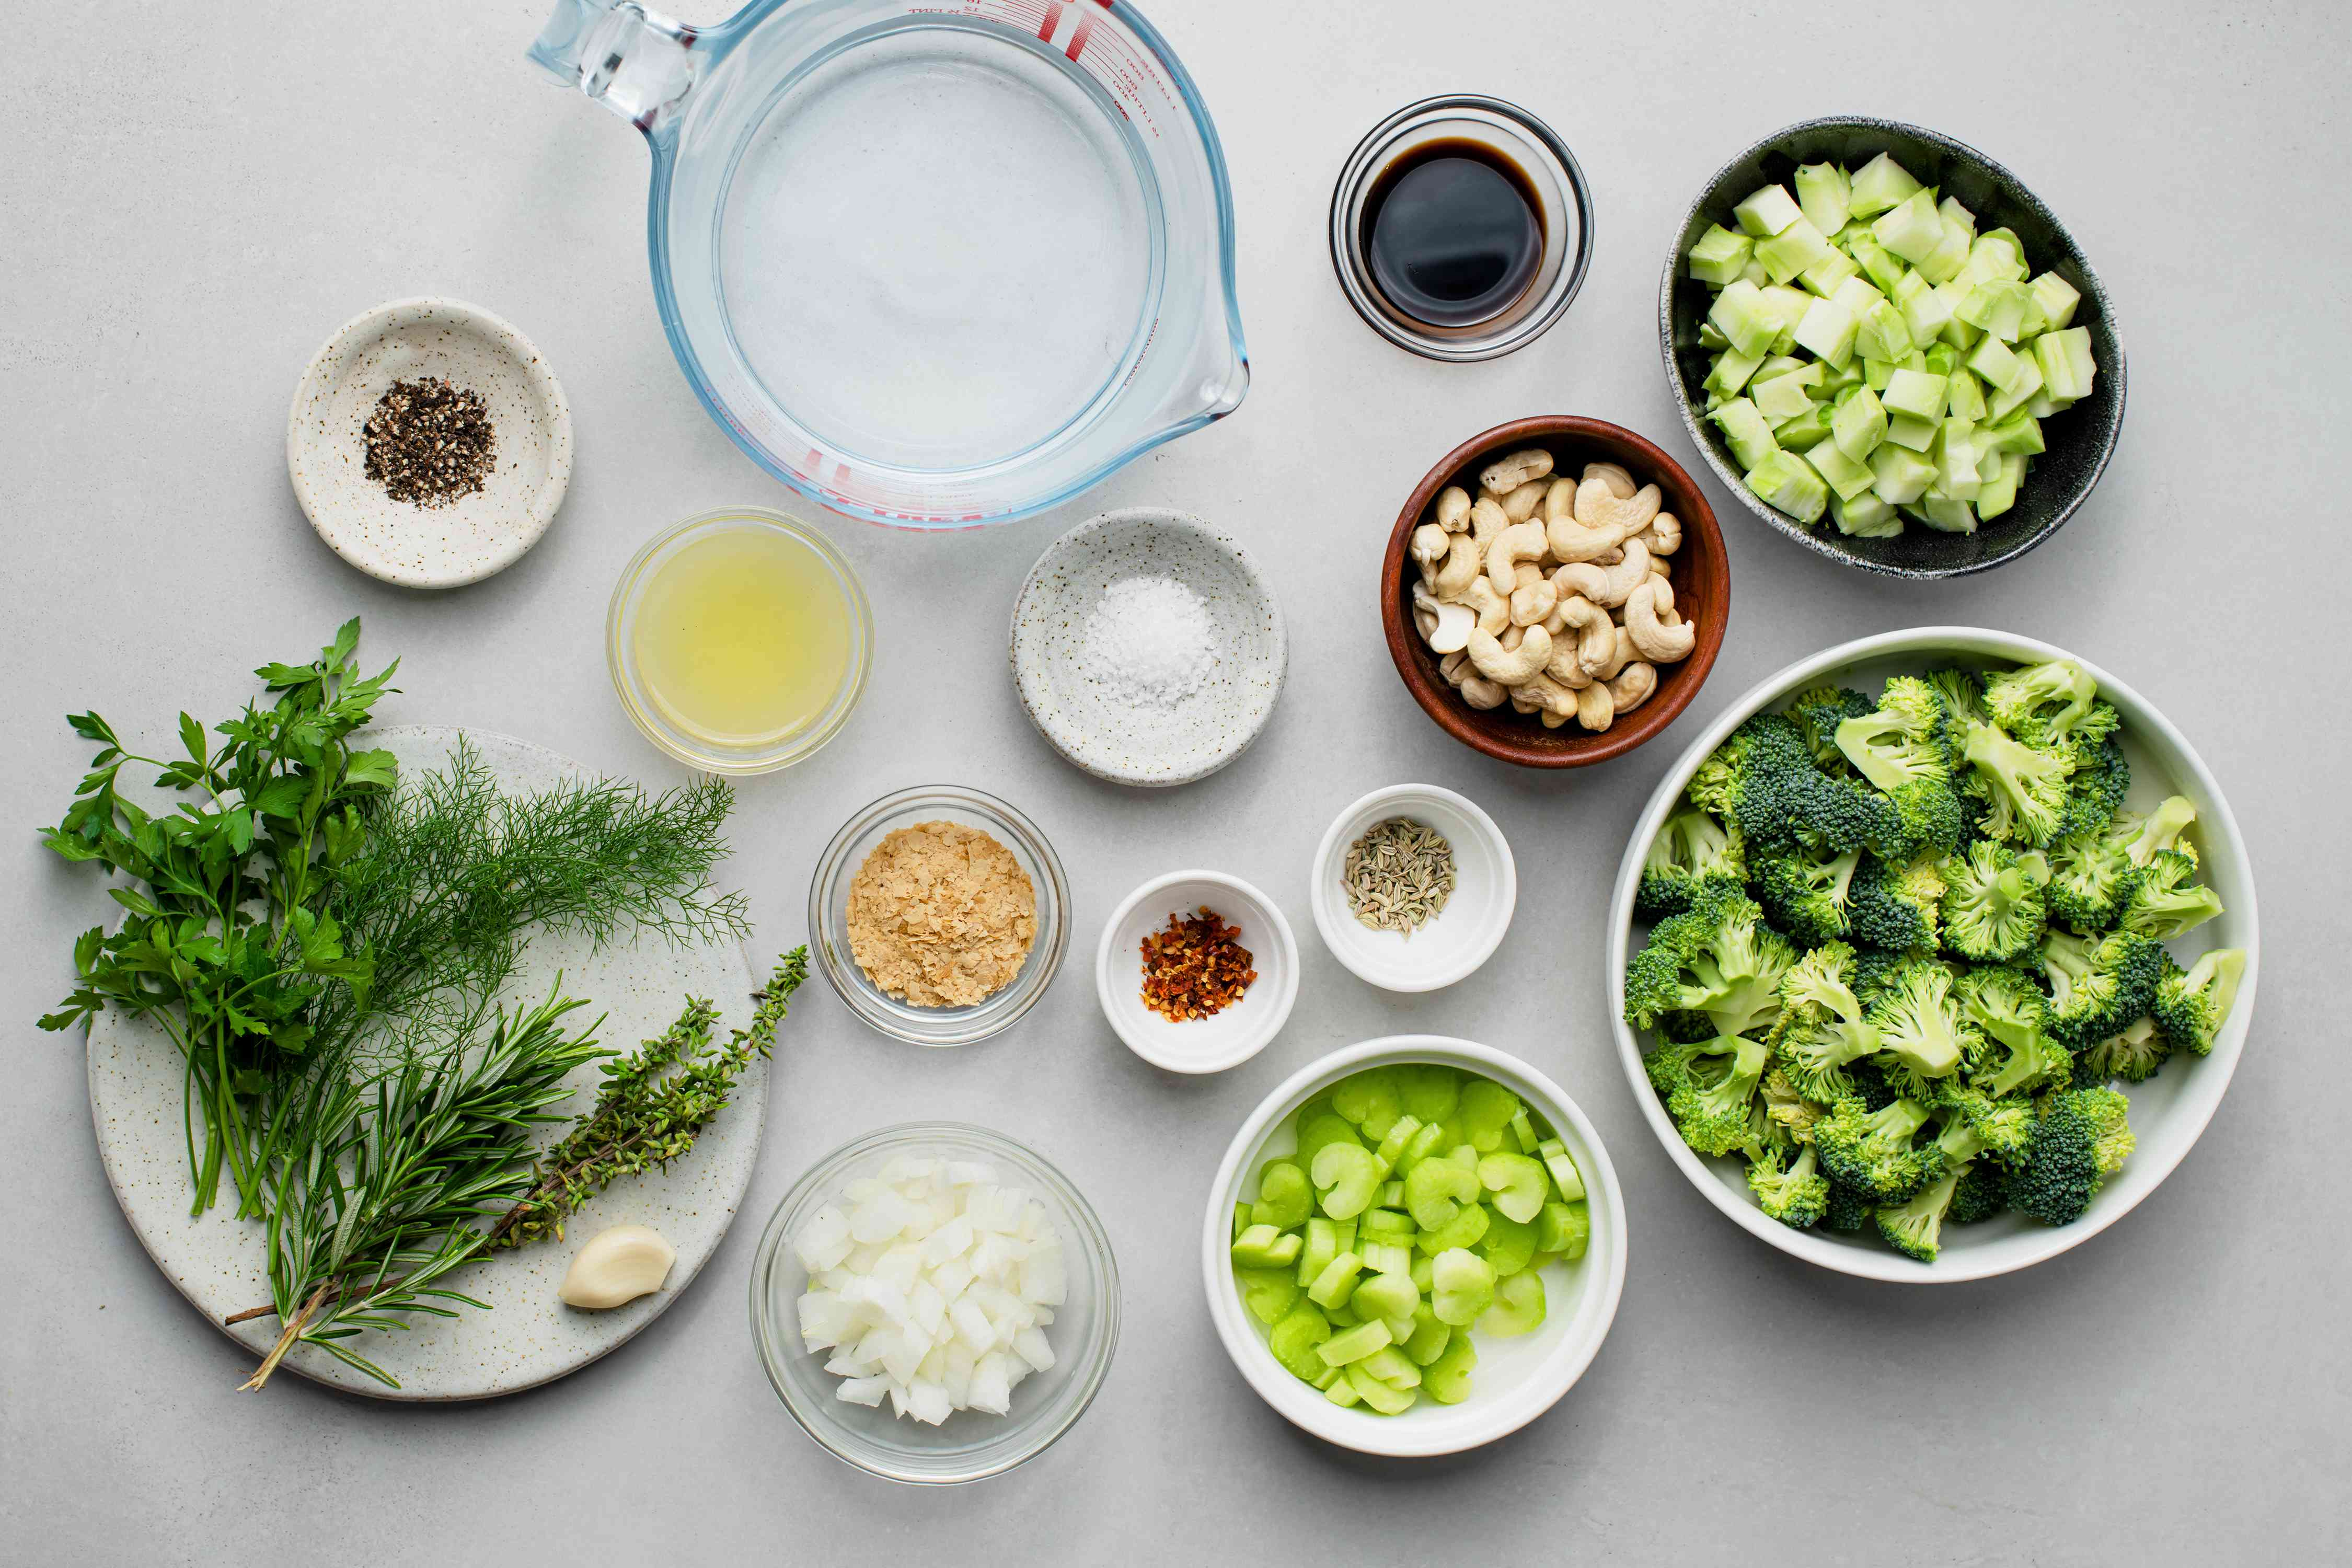 Raw Vegan Cream of Broccoli Soup ingredients